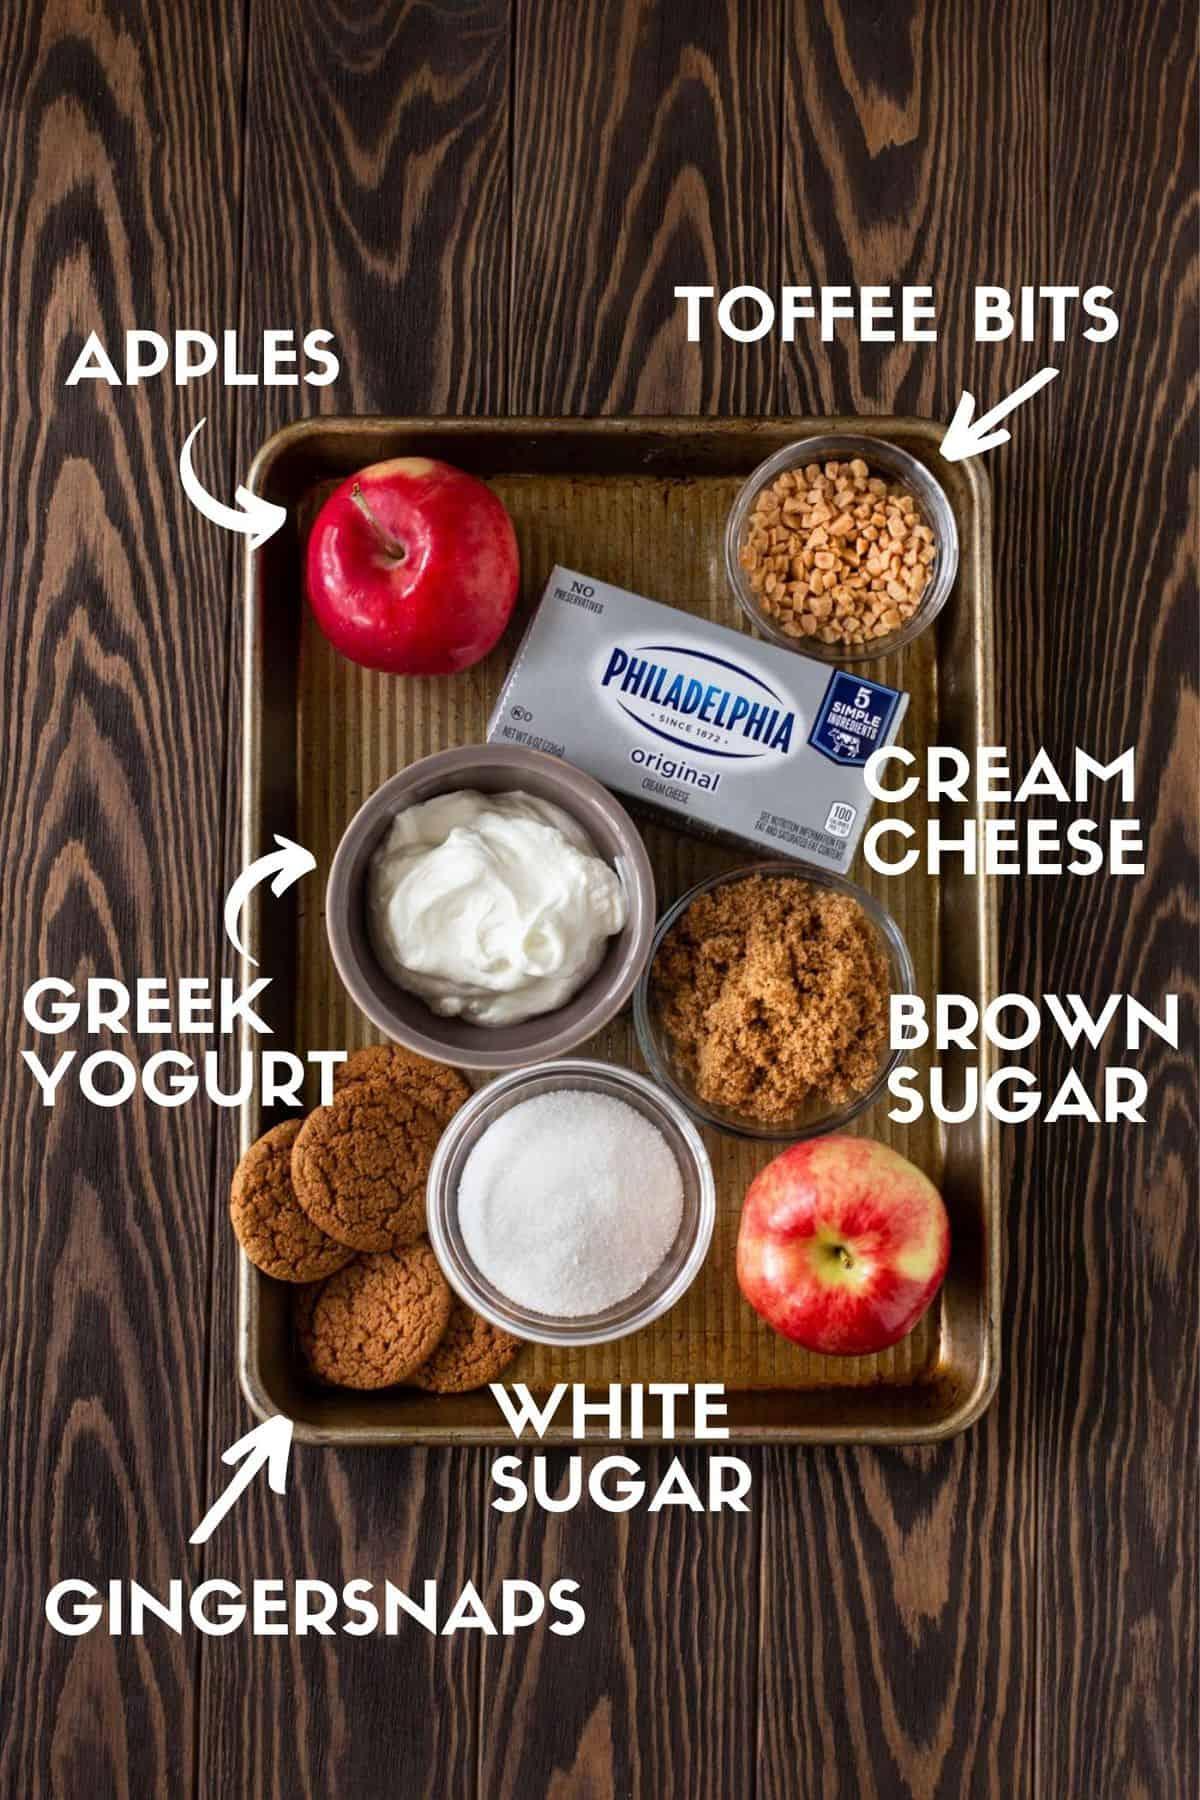 jelly roll pan with apple, toffee bits, cream cheese, greek yogurt, white sugar and brown sugar